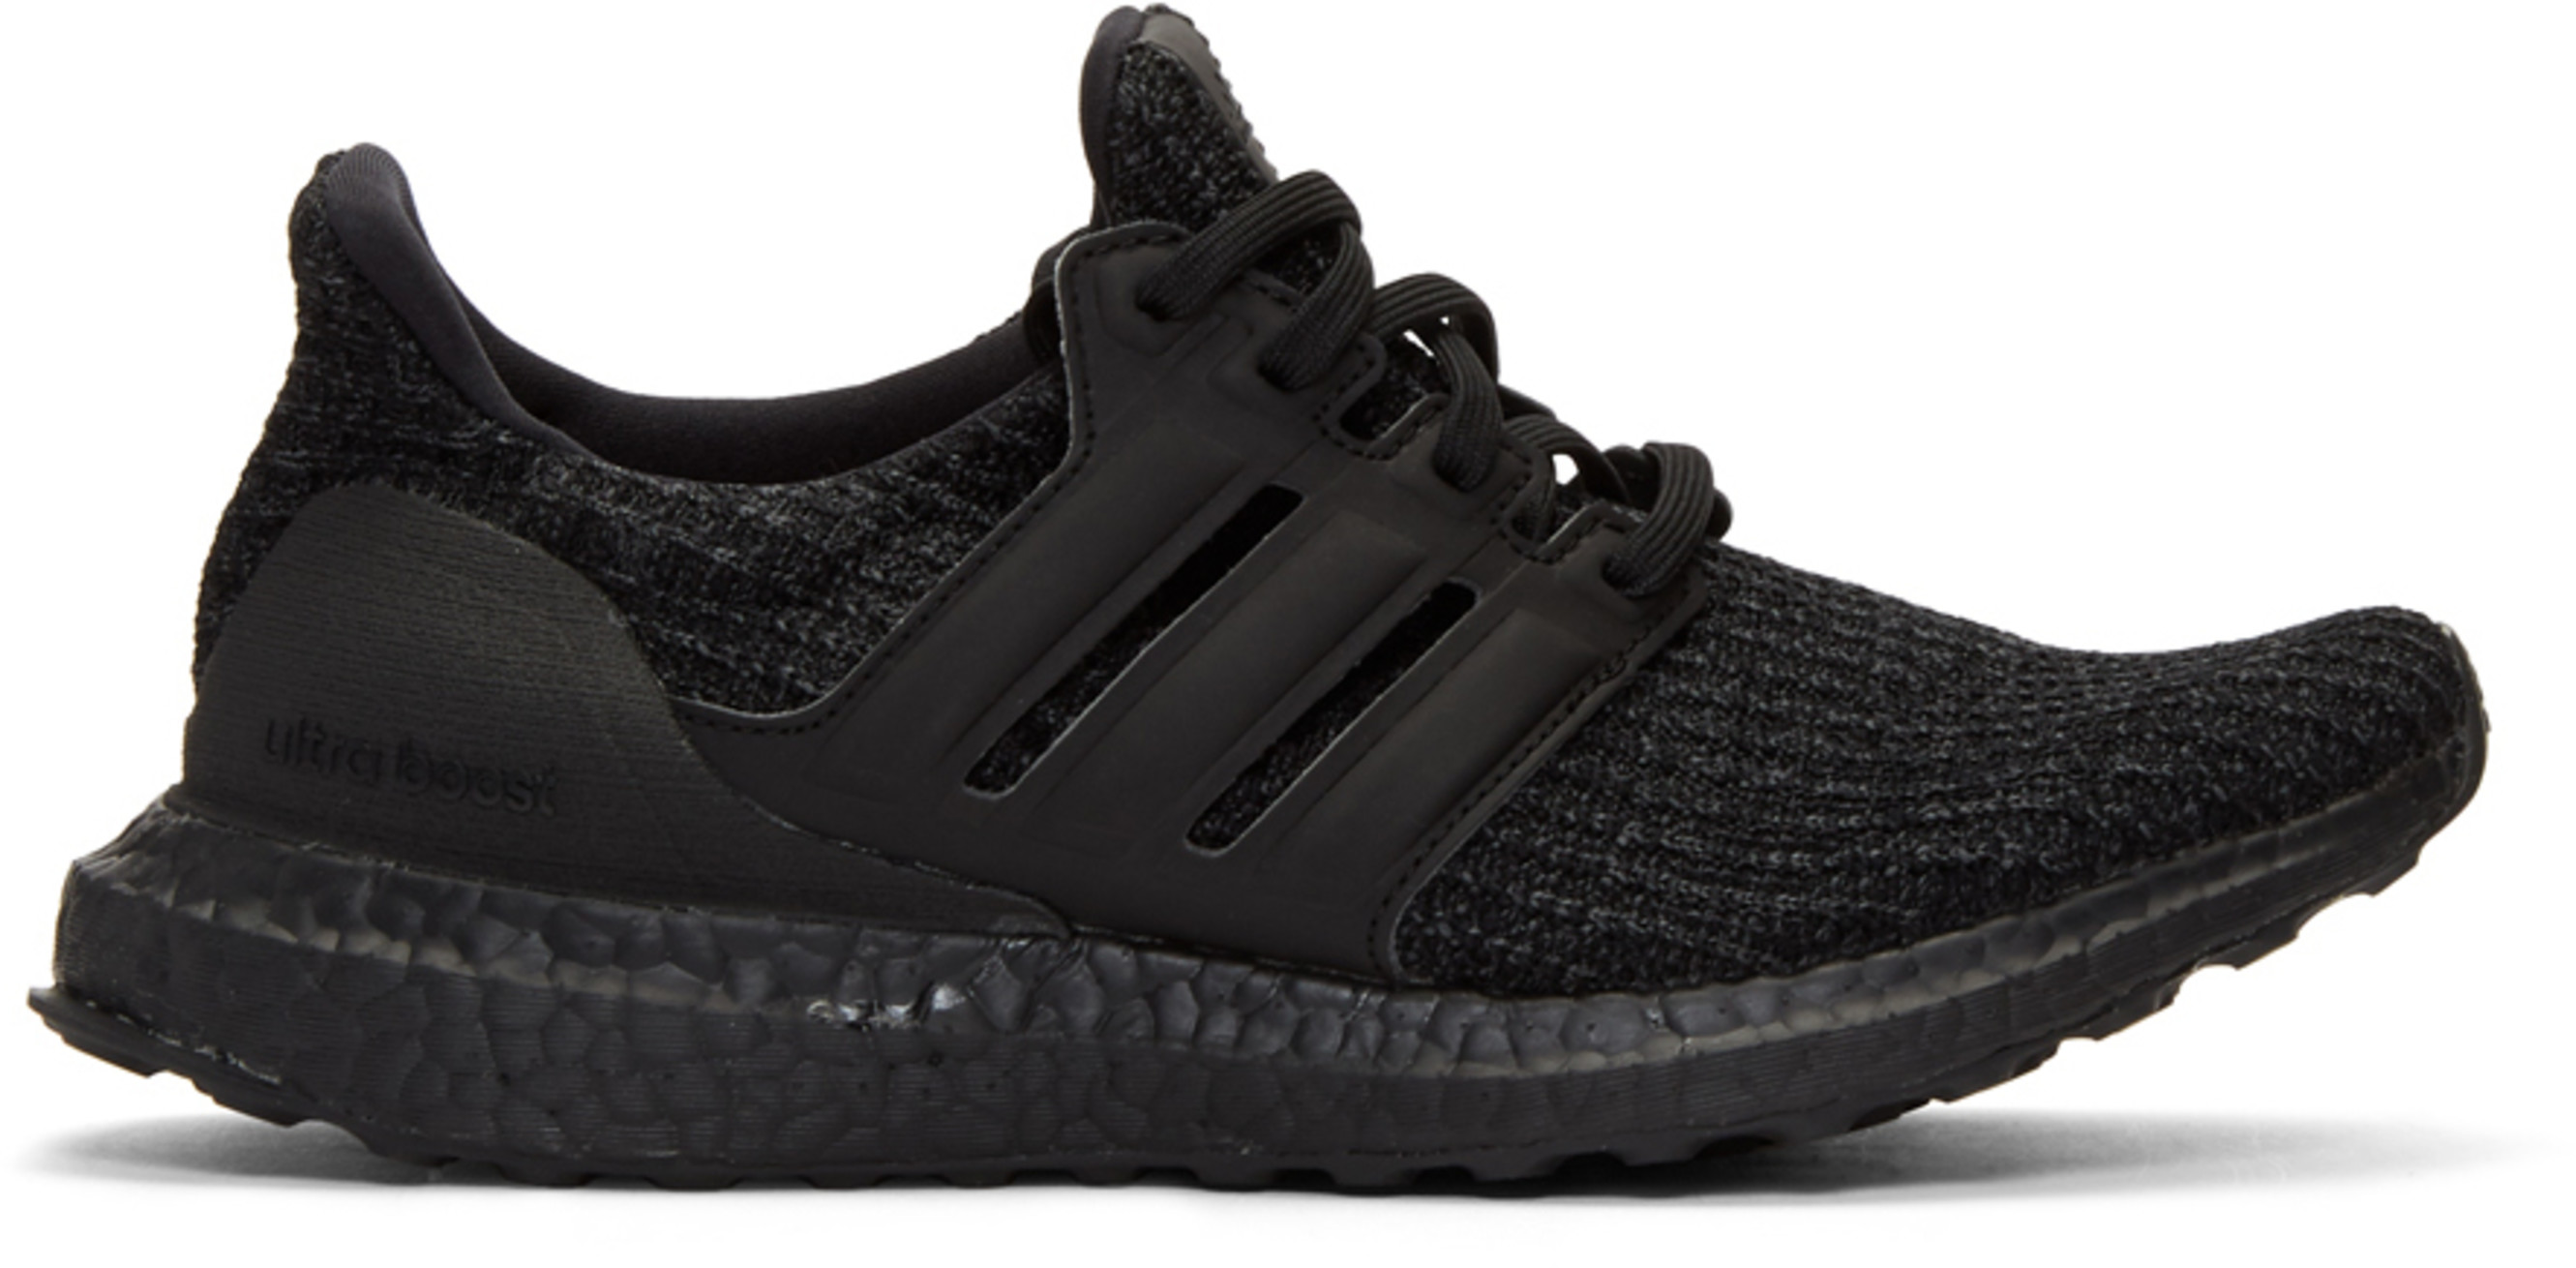 Adidas Originals for Men SS19 Collection  28dfae961